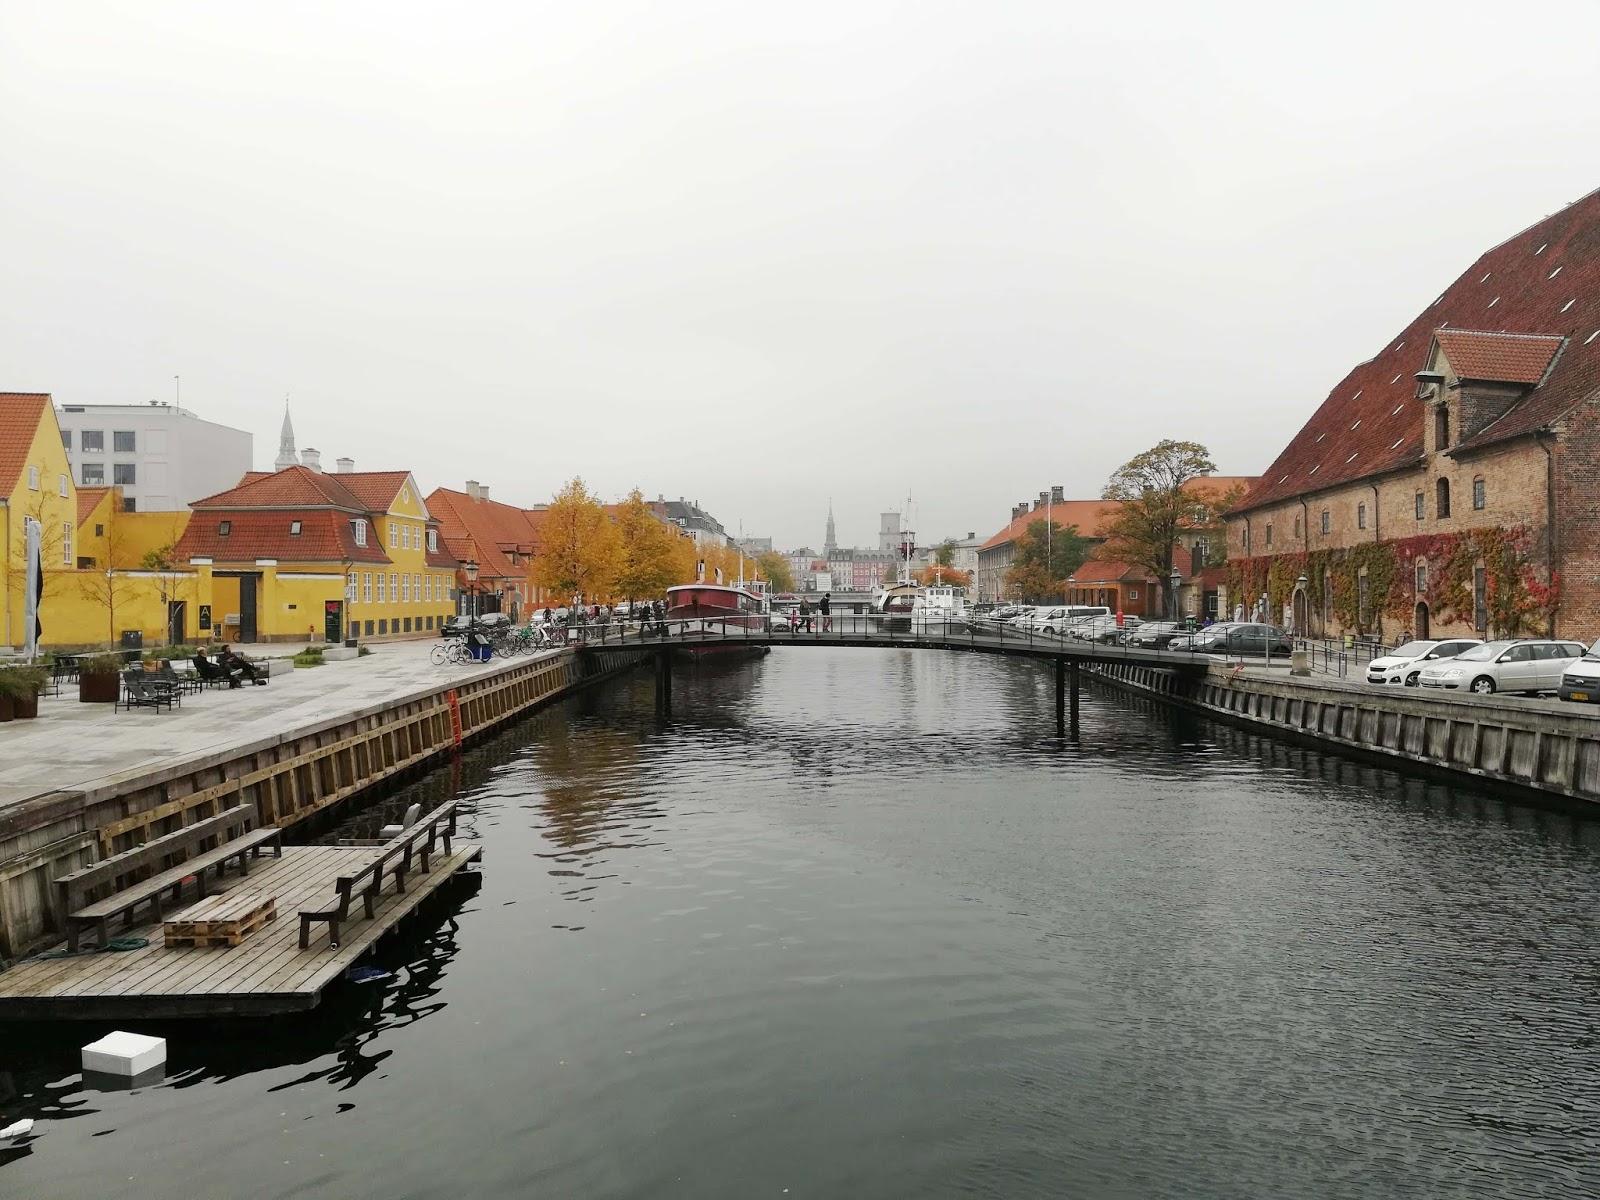 Jesienny weekend w Kopenhadze